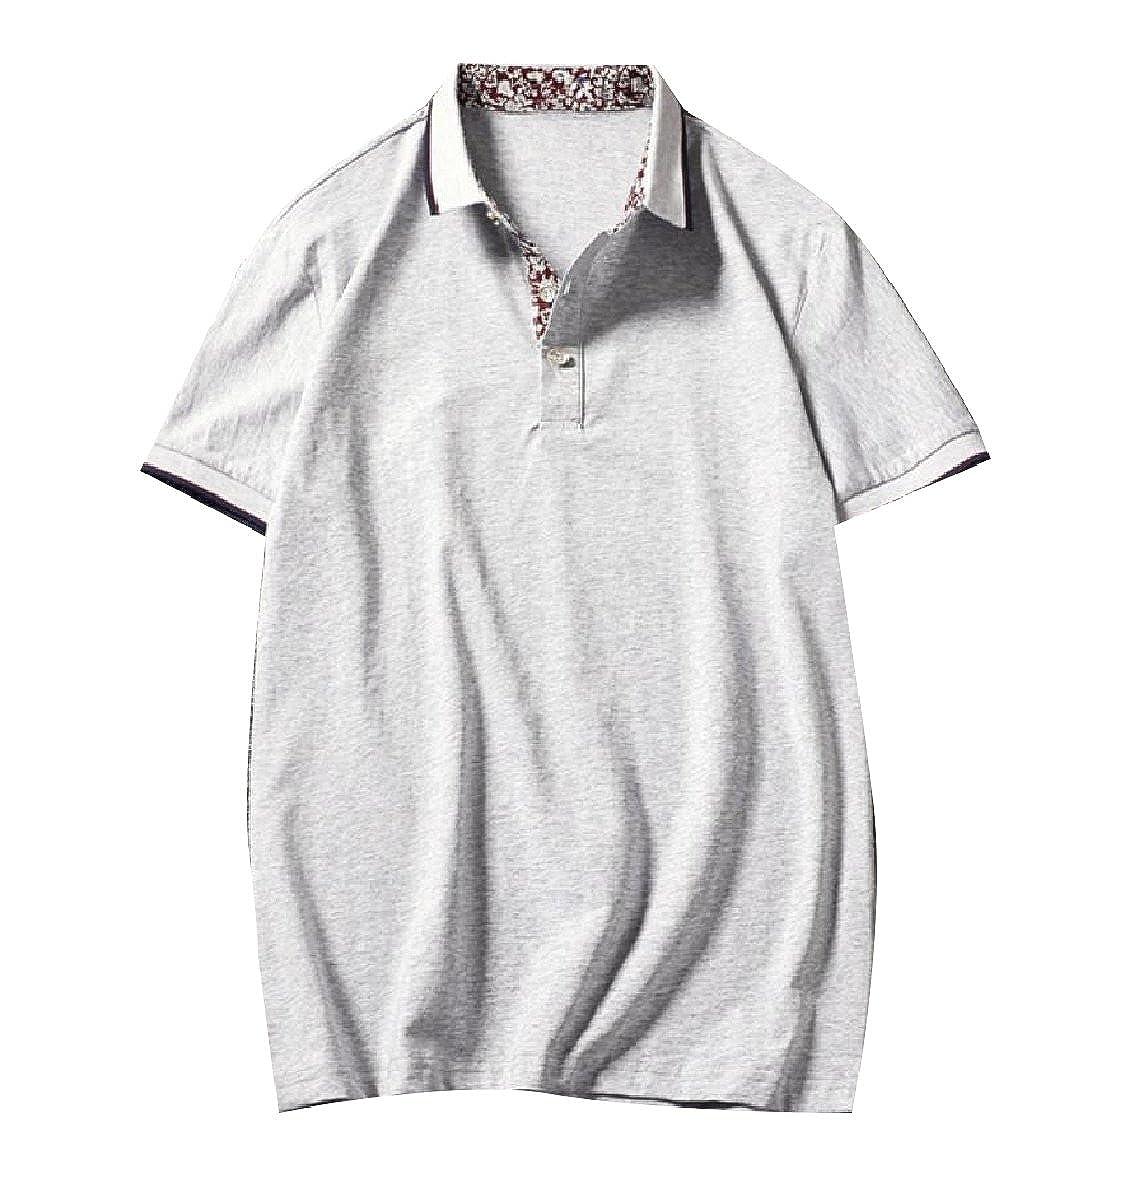 LoveSky-Men Fit Turn Down Collar Short Sleeve Thin Knit Basic Polo Shirt